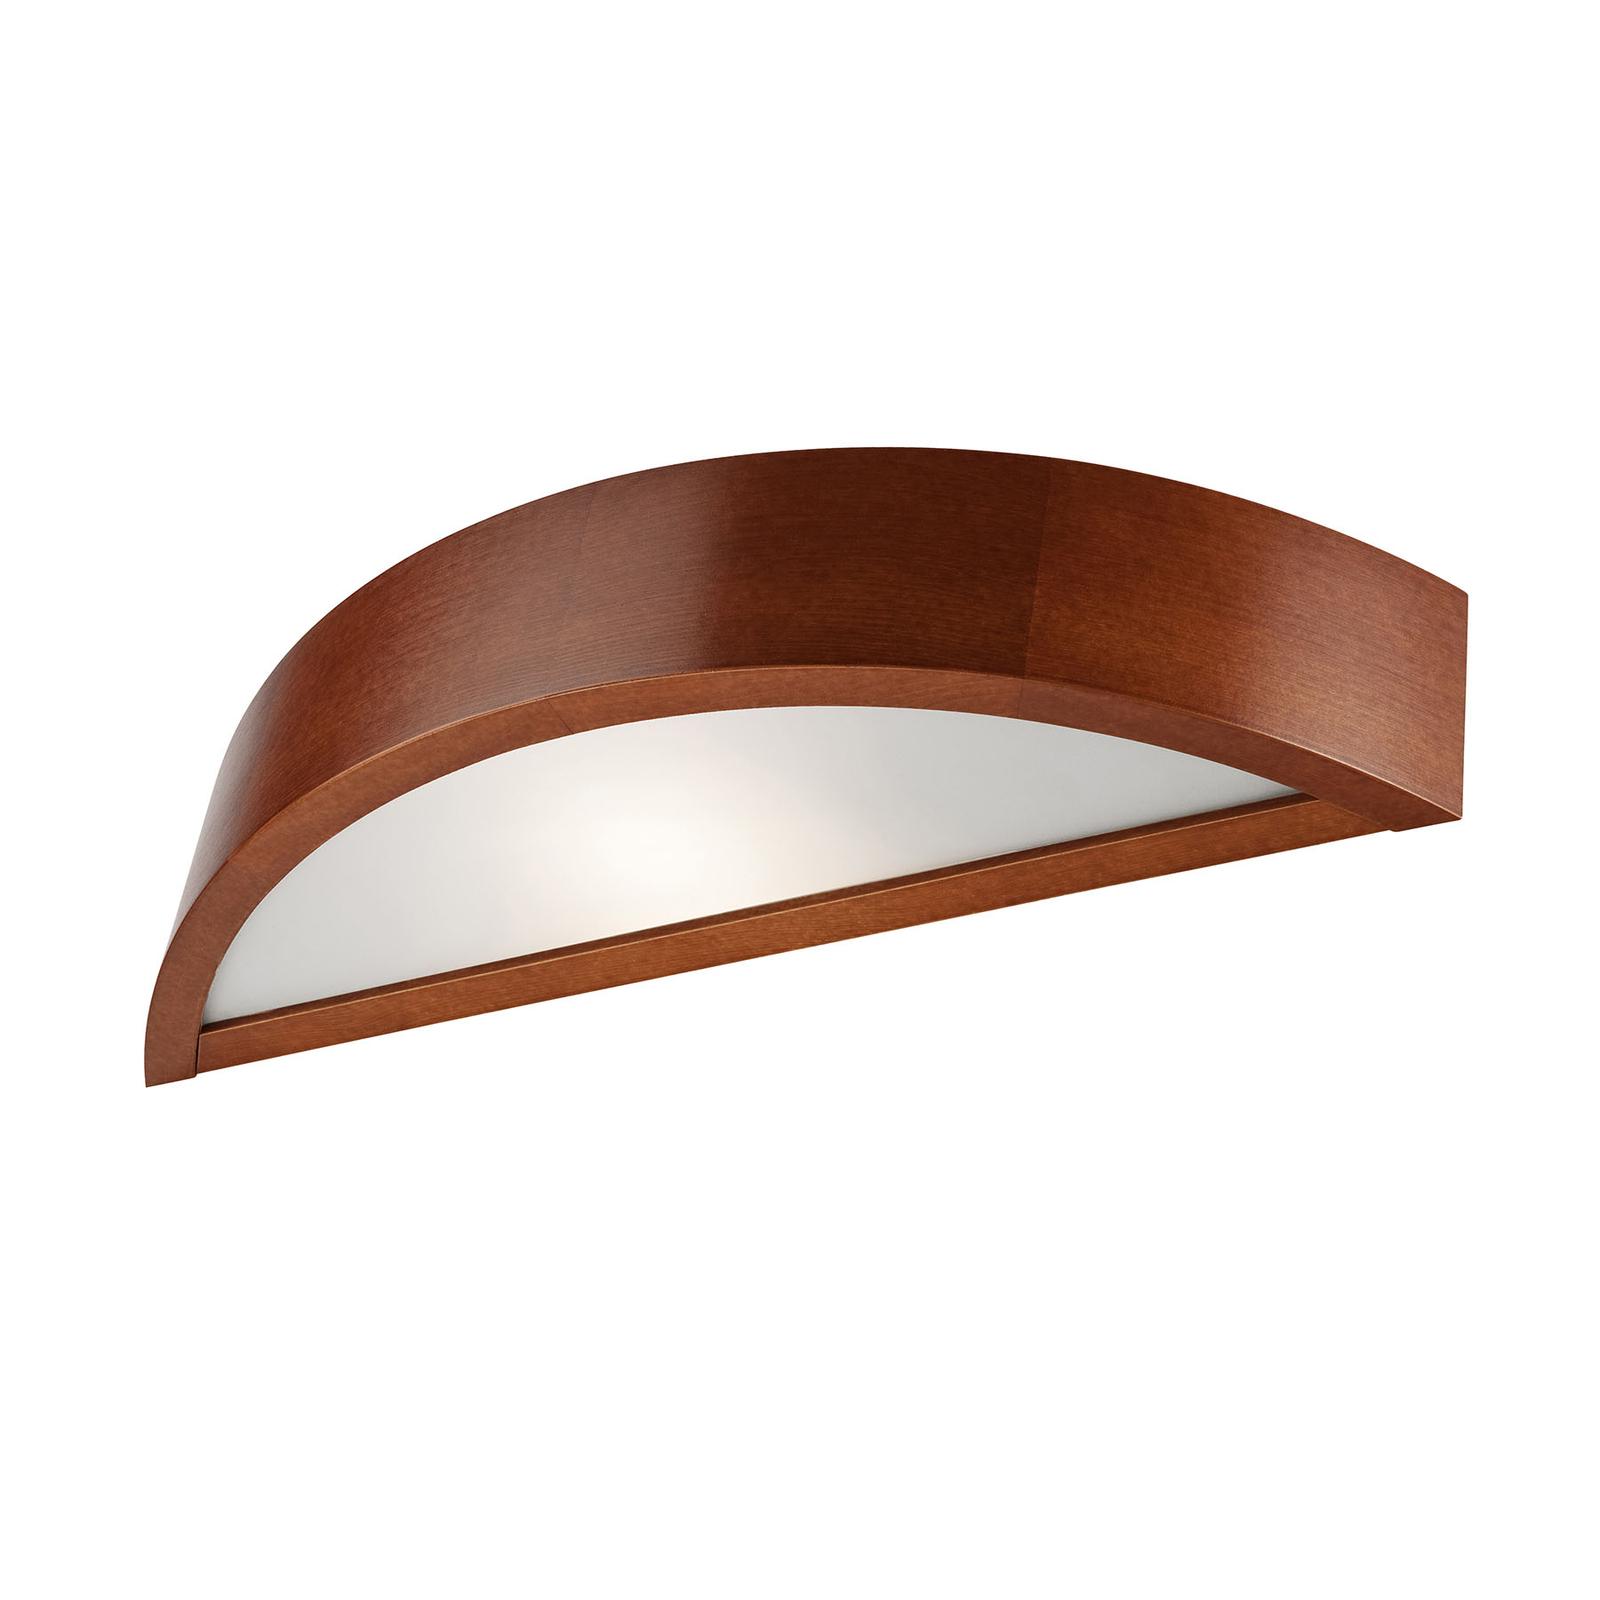 Wandlampe Kerio, halbrund, kiefer rustikal